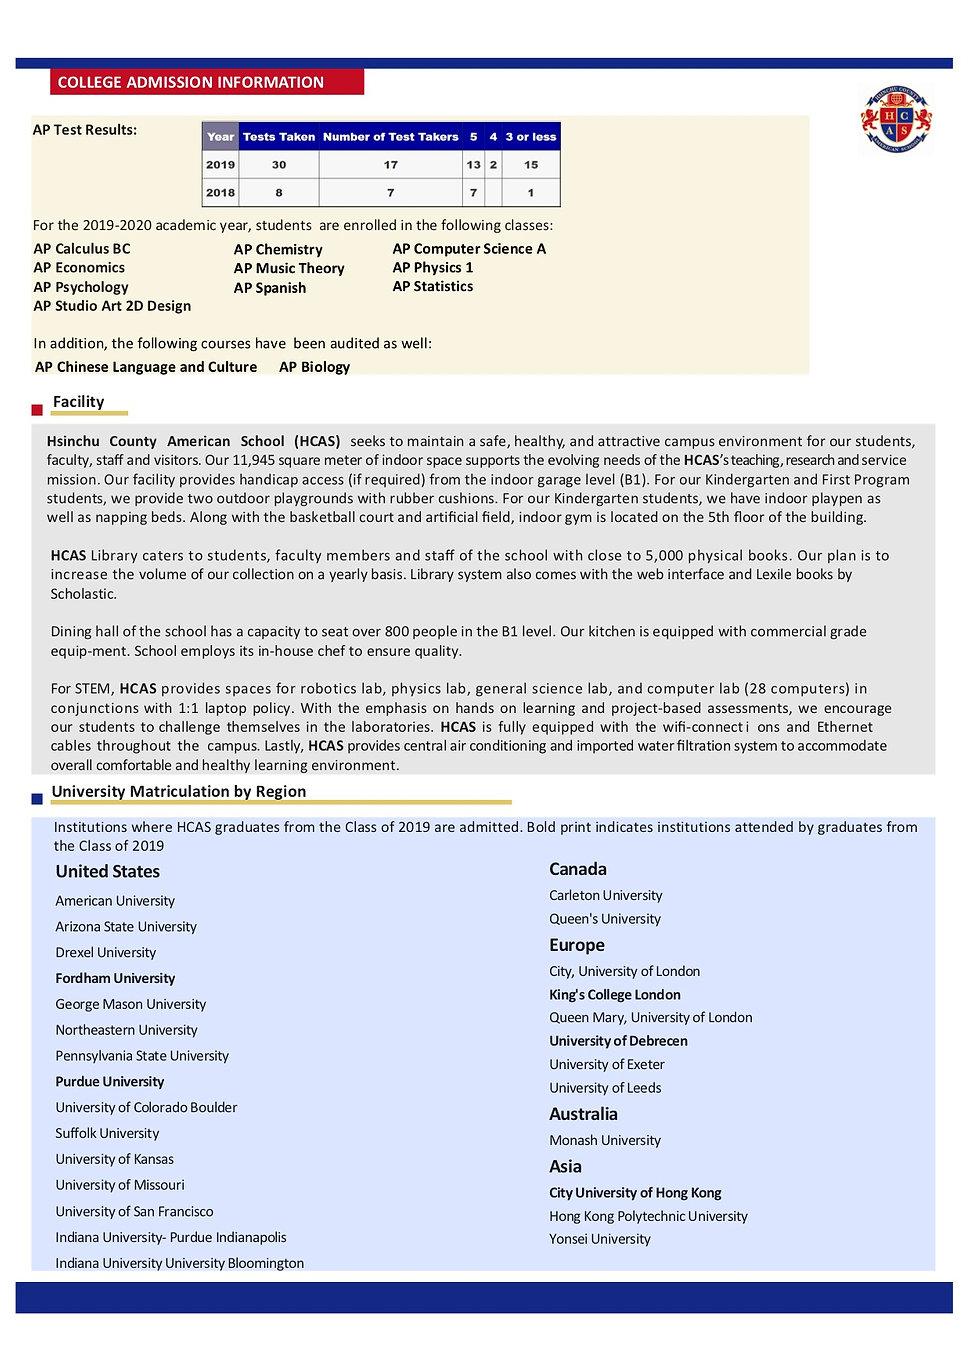 2019 - 2020 HCAS Profile 2.jpg